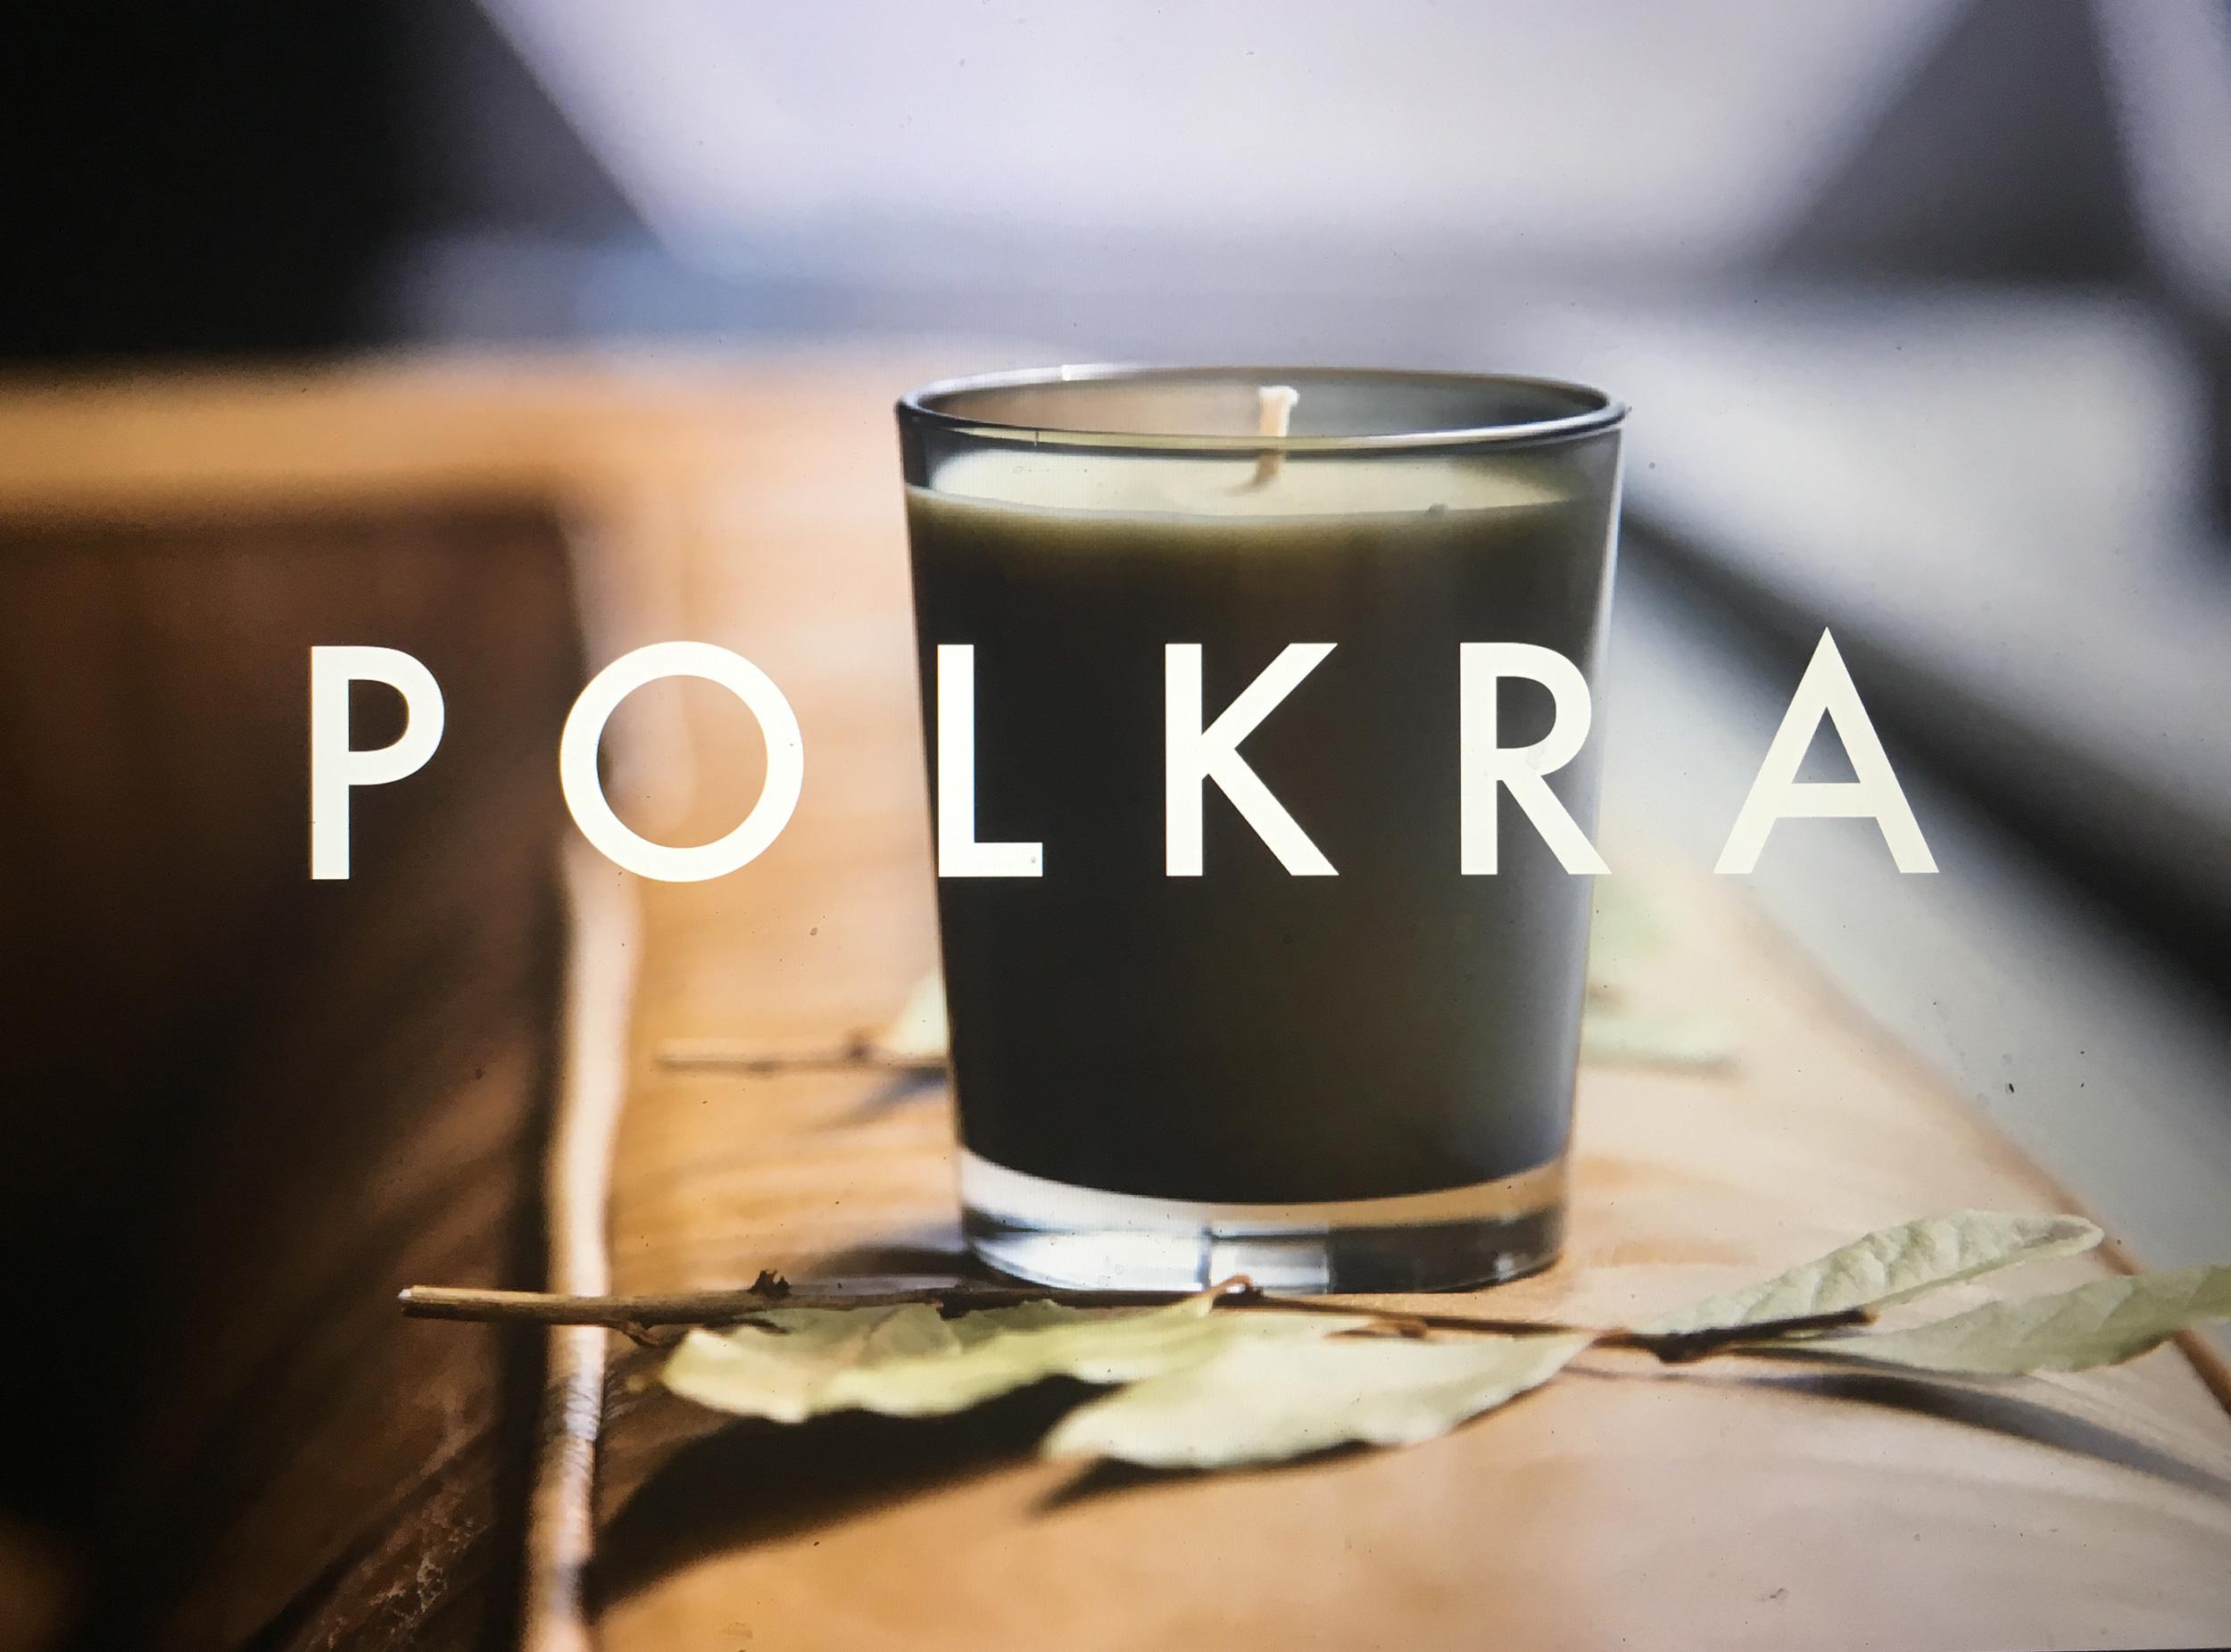 Polkra_03.jpg